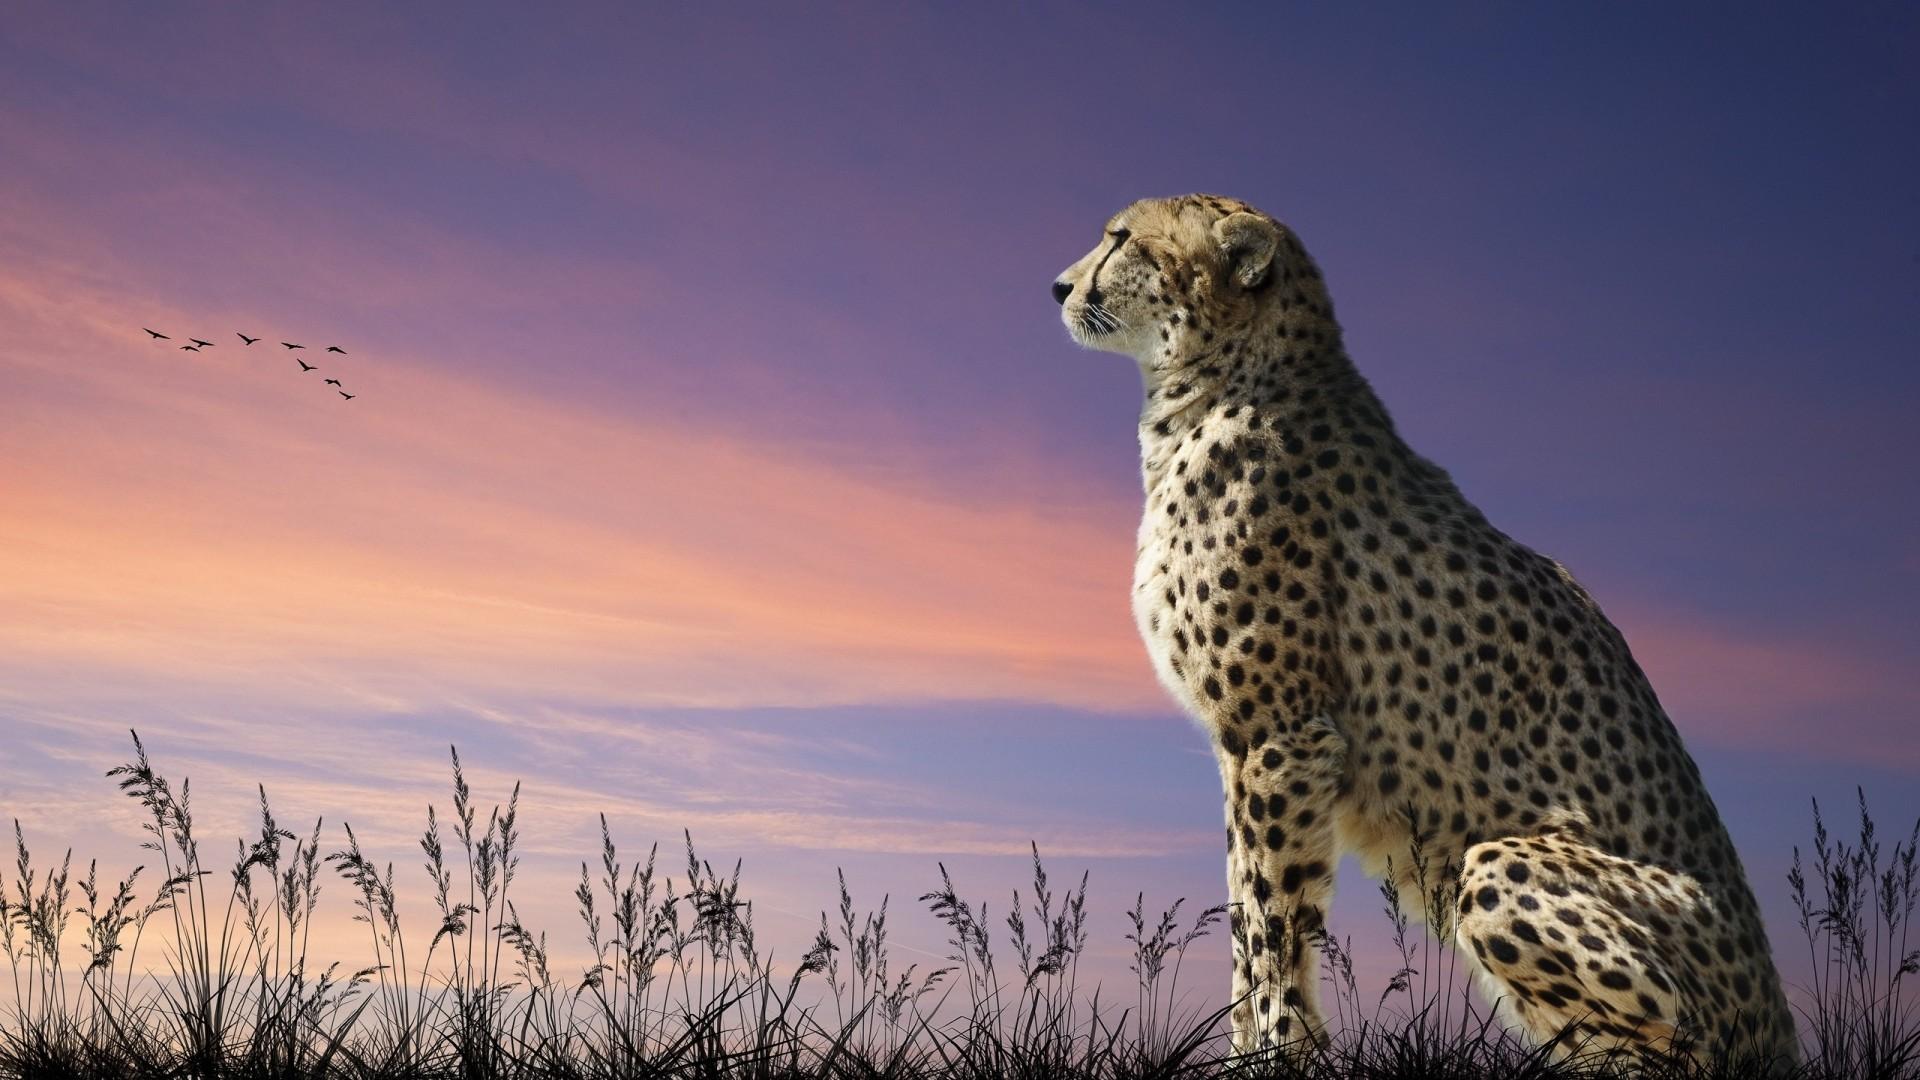 Animals Full HD Wallpapers – 1080p Wallpapers | Full HD Wallpaper  leopard sunset field,